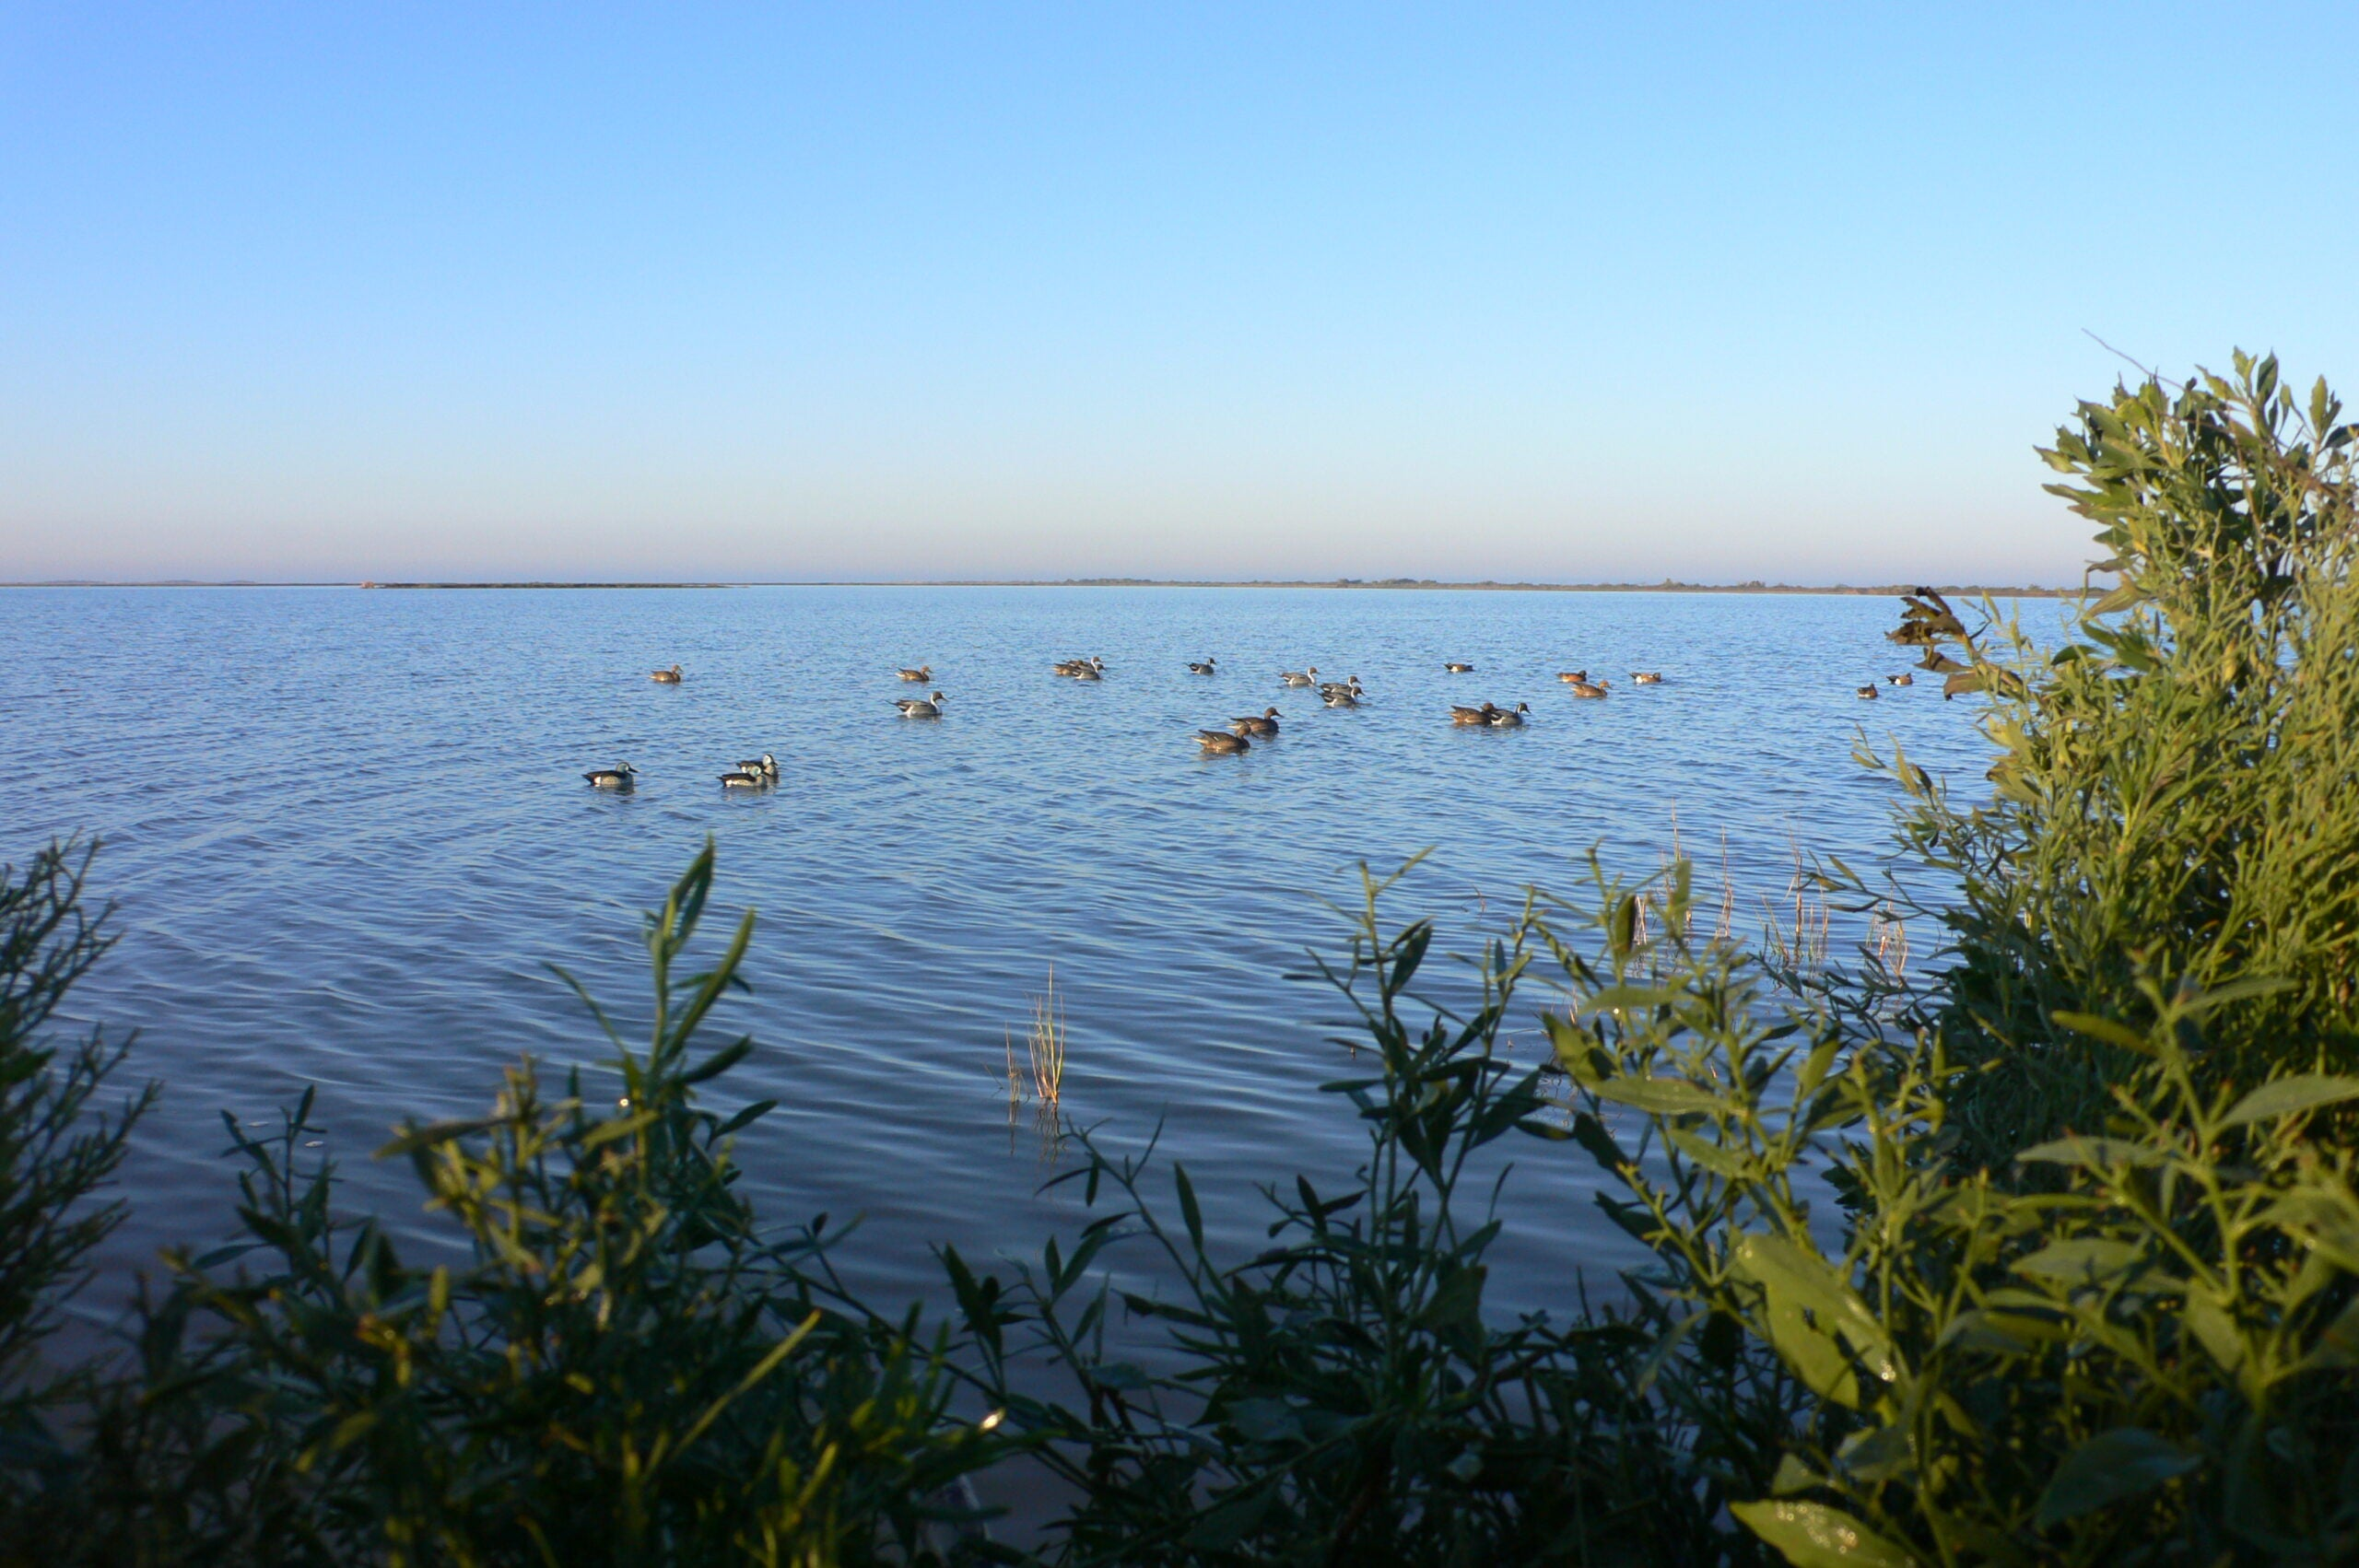 Trip Report: Texas Duck Hunting At Bay Flats Lodge